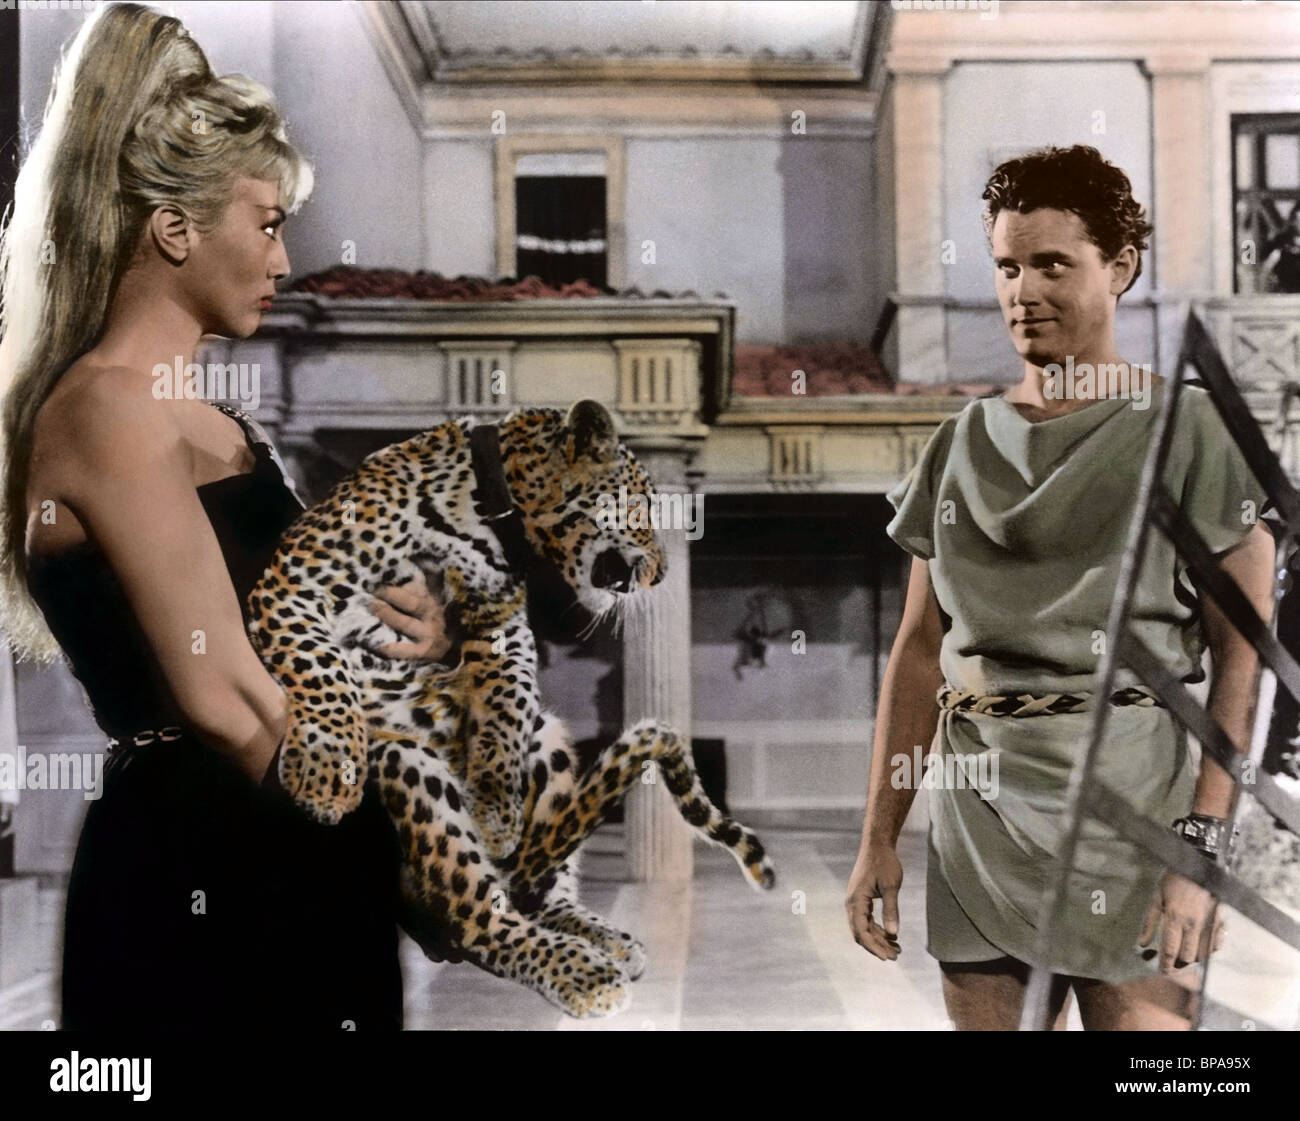 MYLENE DEMONGEOT, JEFFREY HUNTER, GOLD FOR THE CAESARS, 1963 - Stock Image